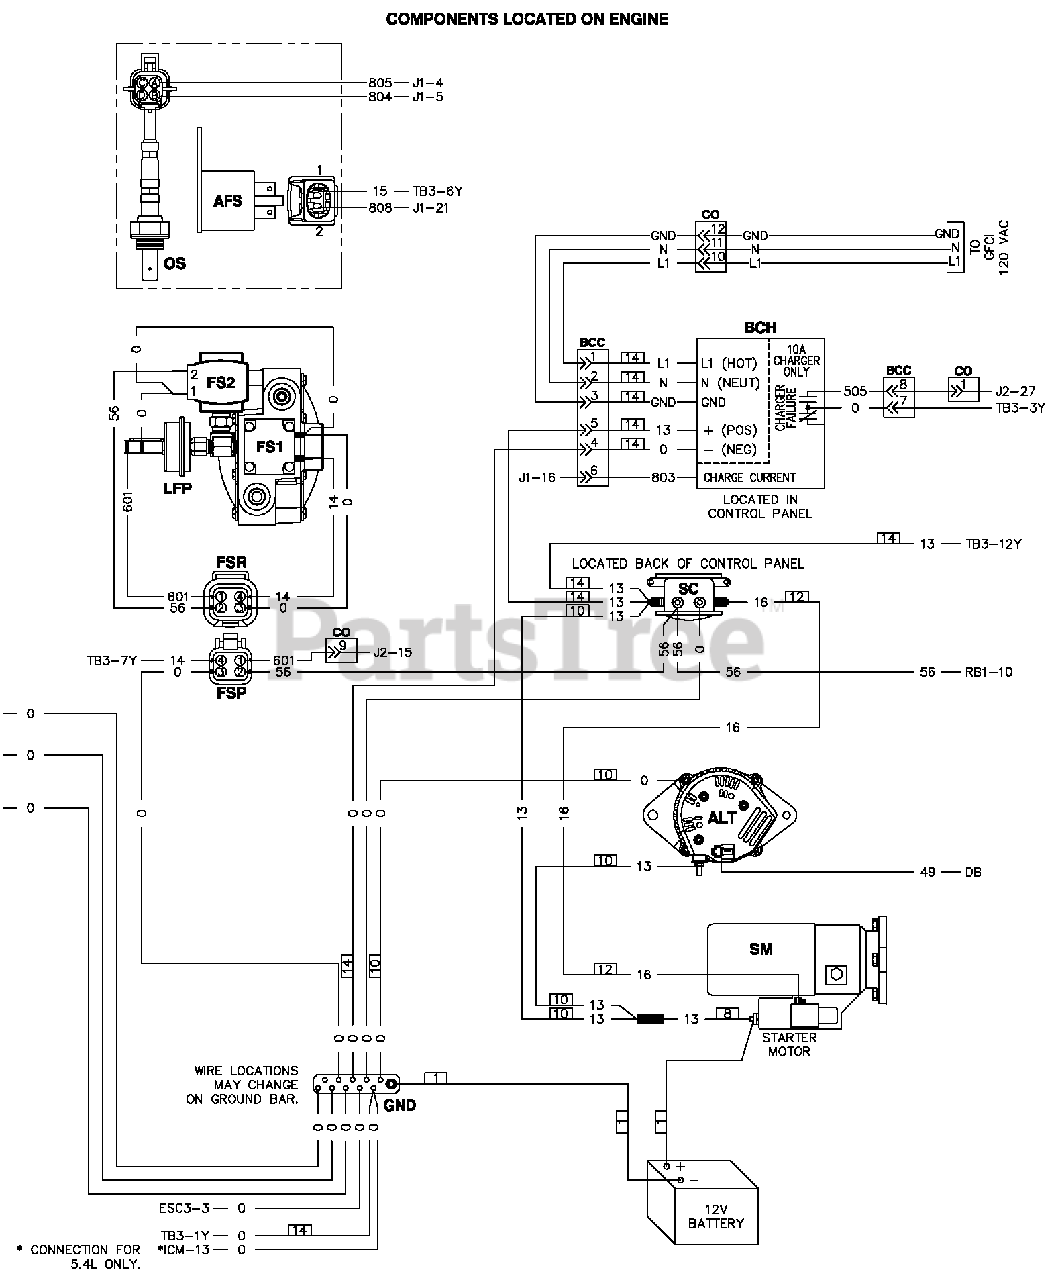 generac engine wiring diagram generac qt10068kvnna generac 100kw home standby generator  sn  generac 100kw home standby generator